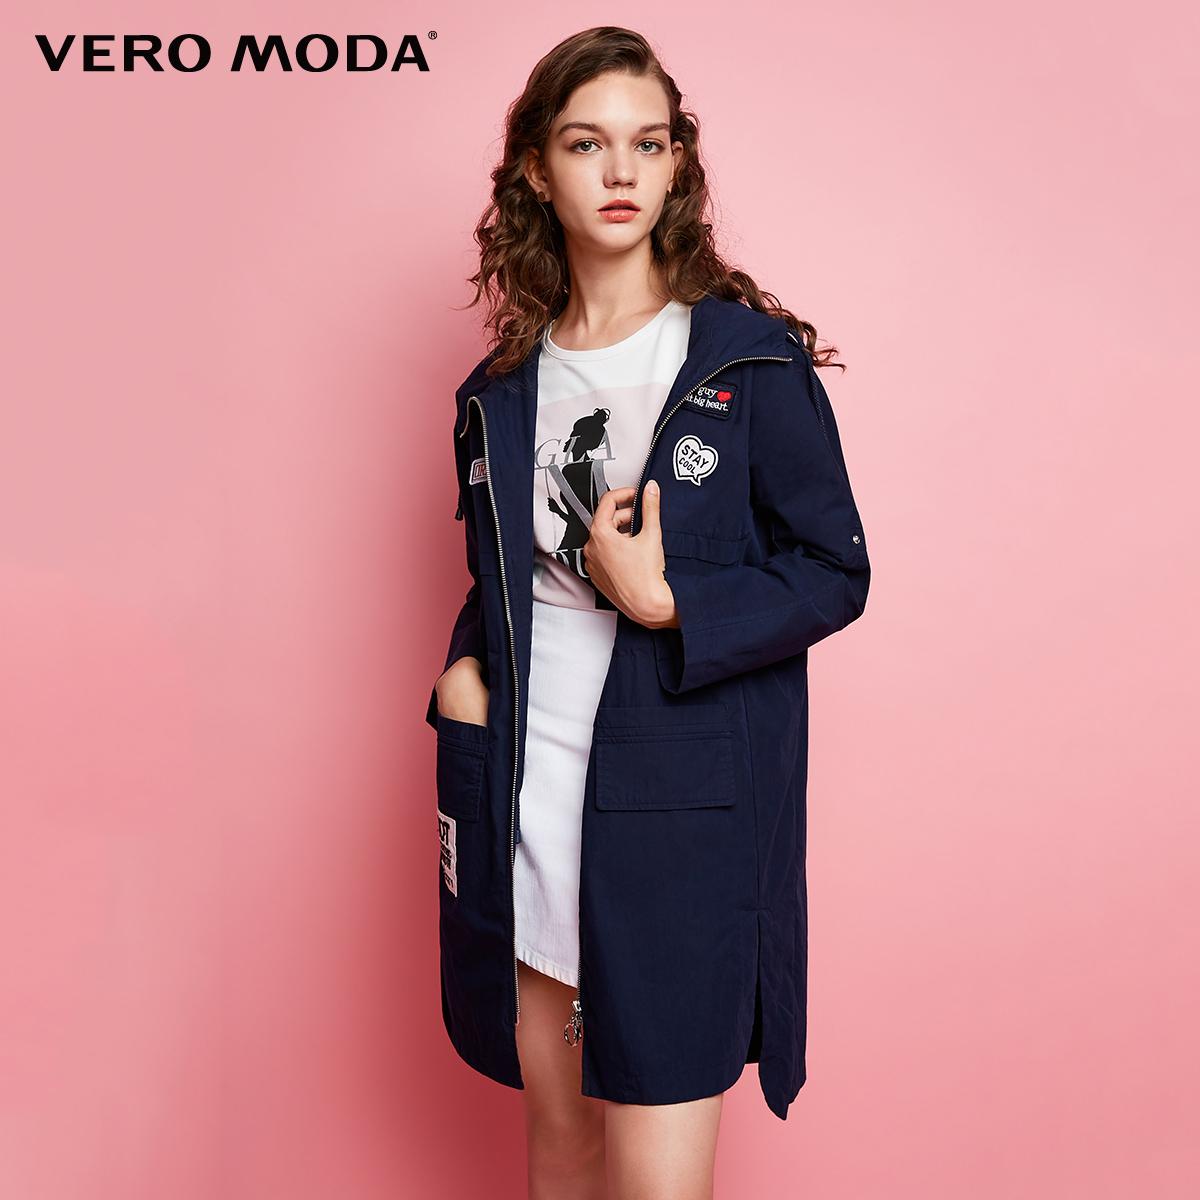 Vero Moda2017秋季新款户外风贴标连帽中长款风衣|317321517